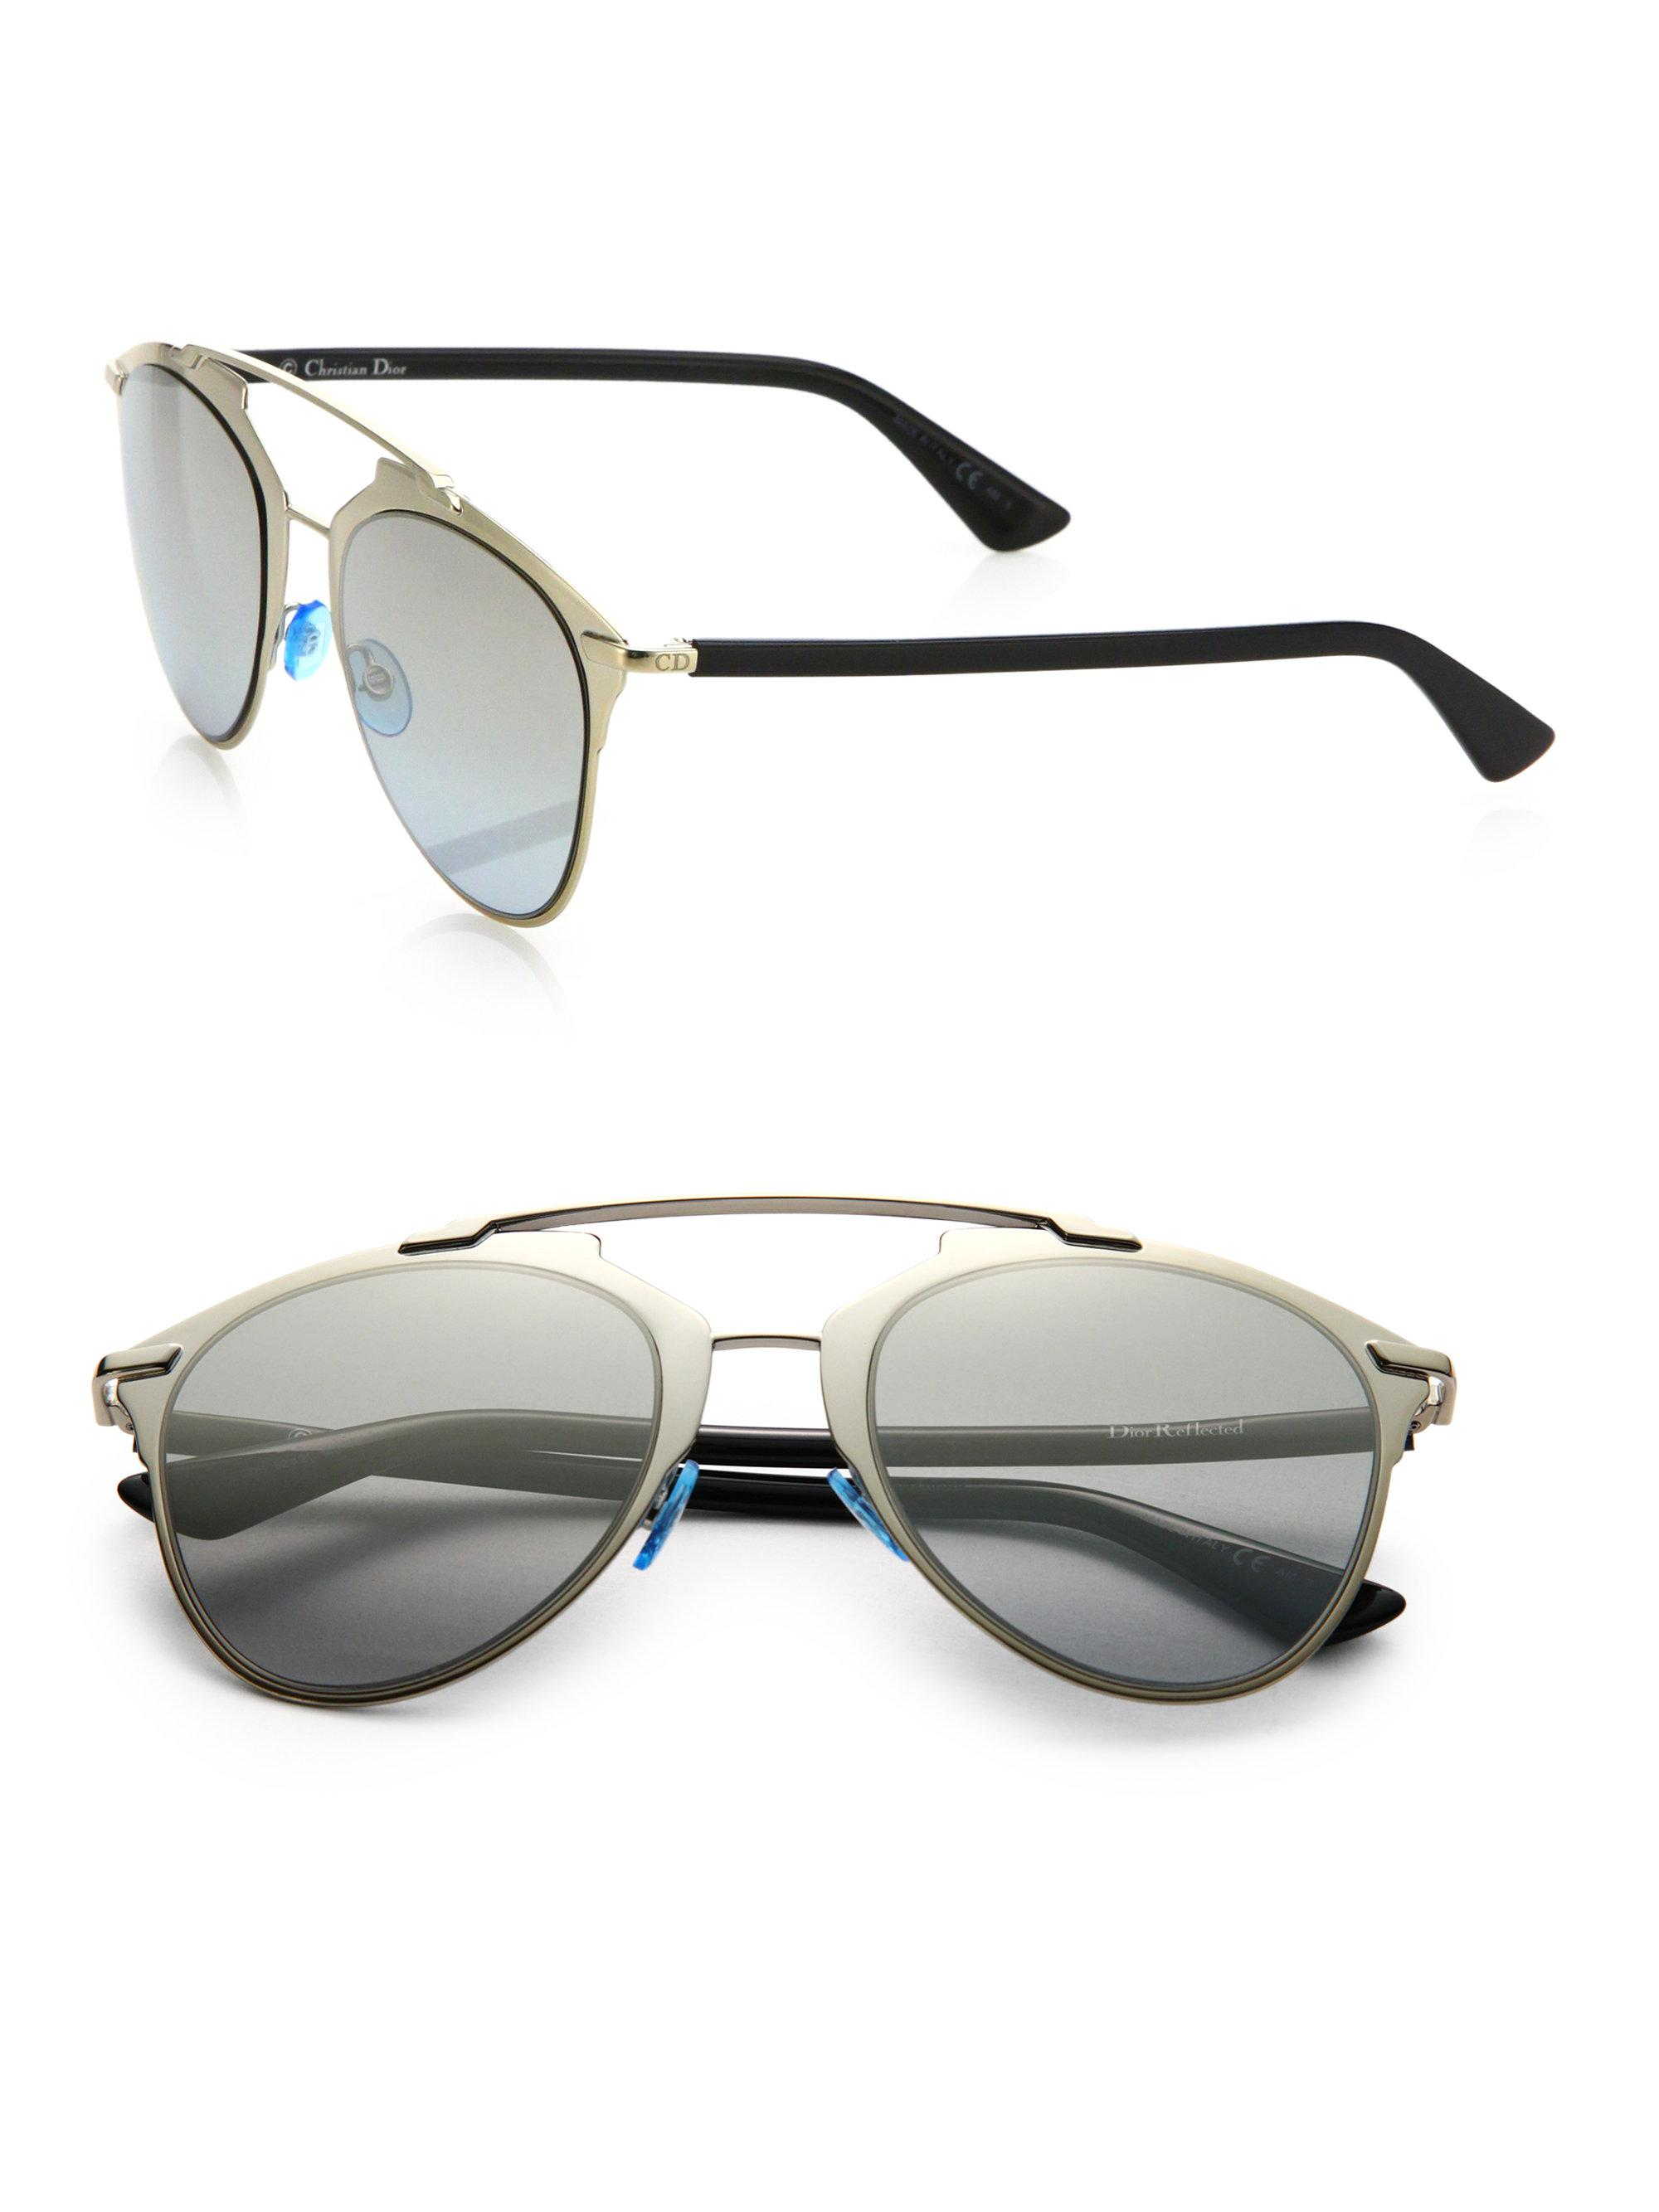 7da9776ccb9db9 Dior Reflected 52mm Modified Pantos Sunglasses in Black - Save ...